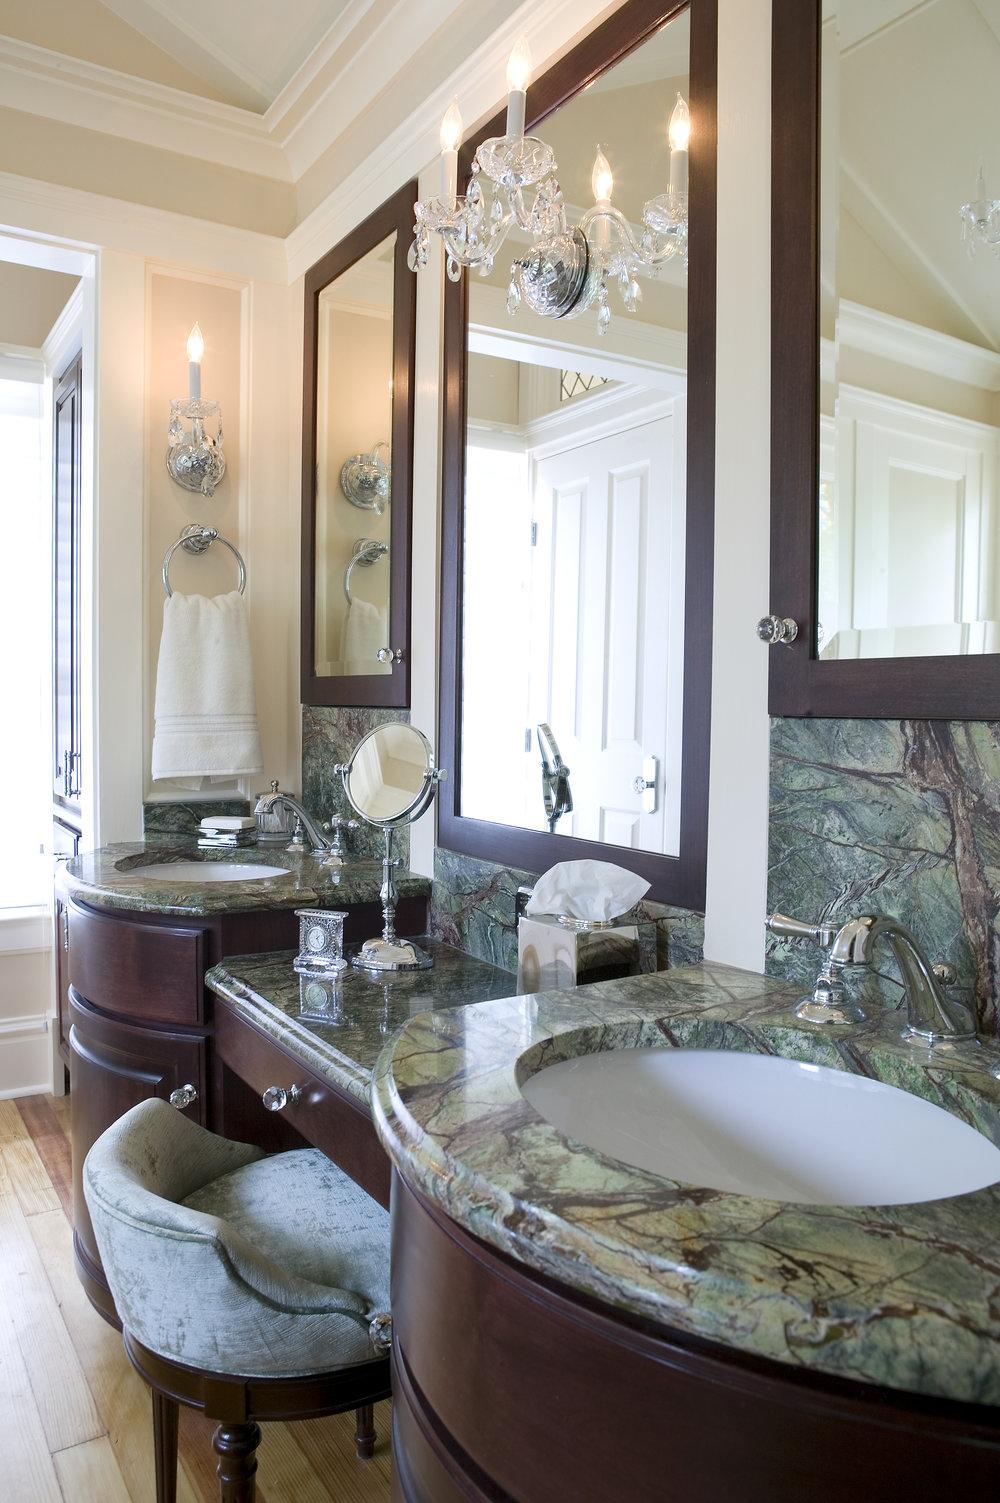 Bathroom interior designer Chicago 1210 GREENWOOD 010.jpg